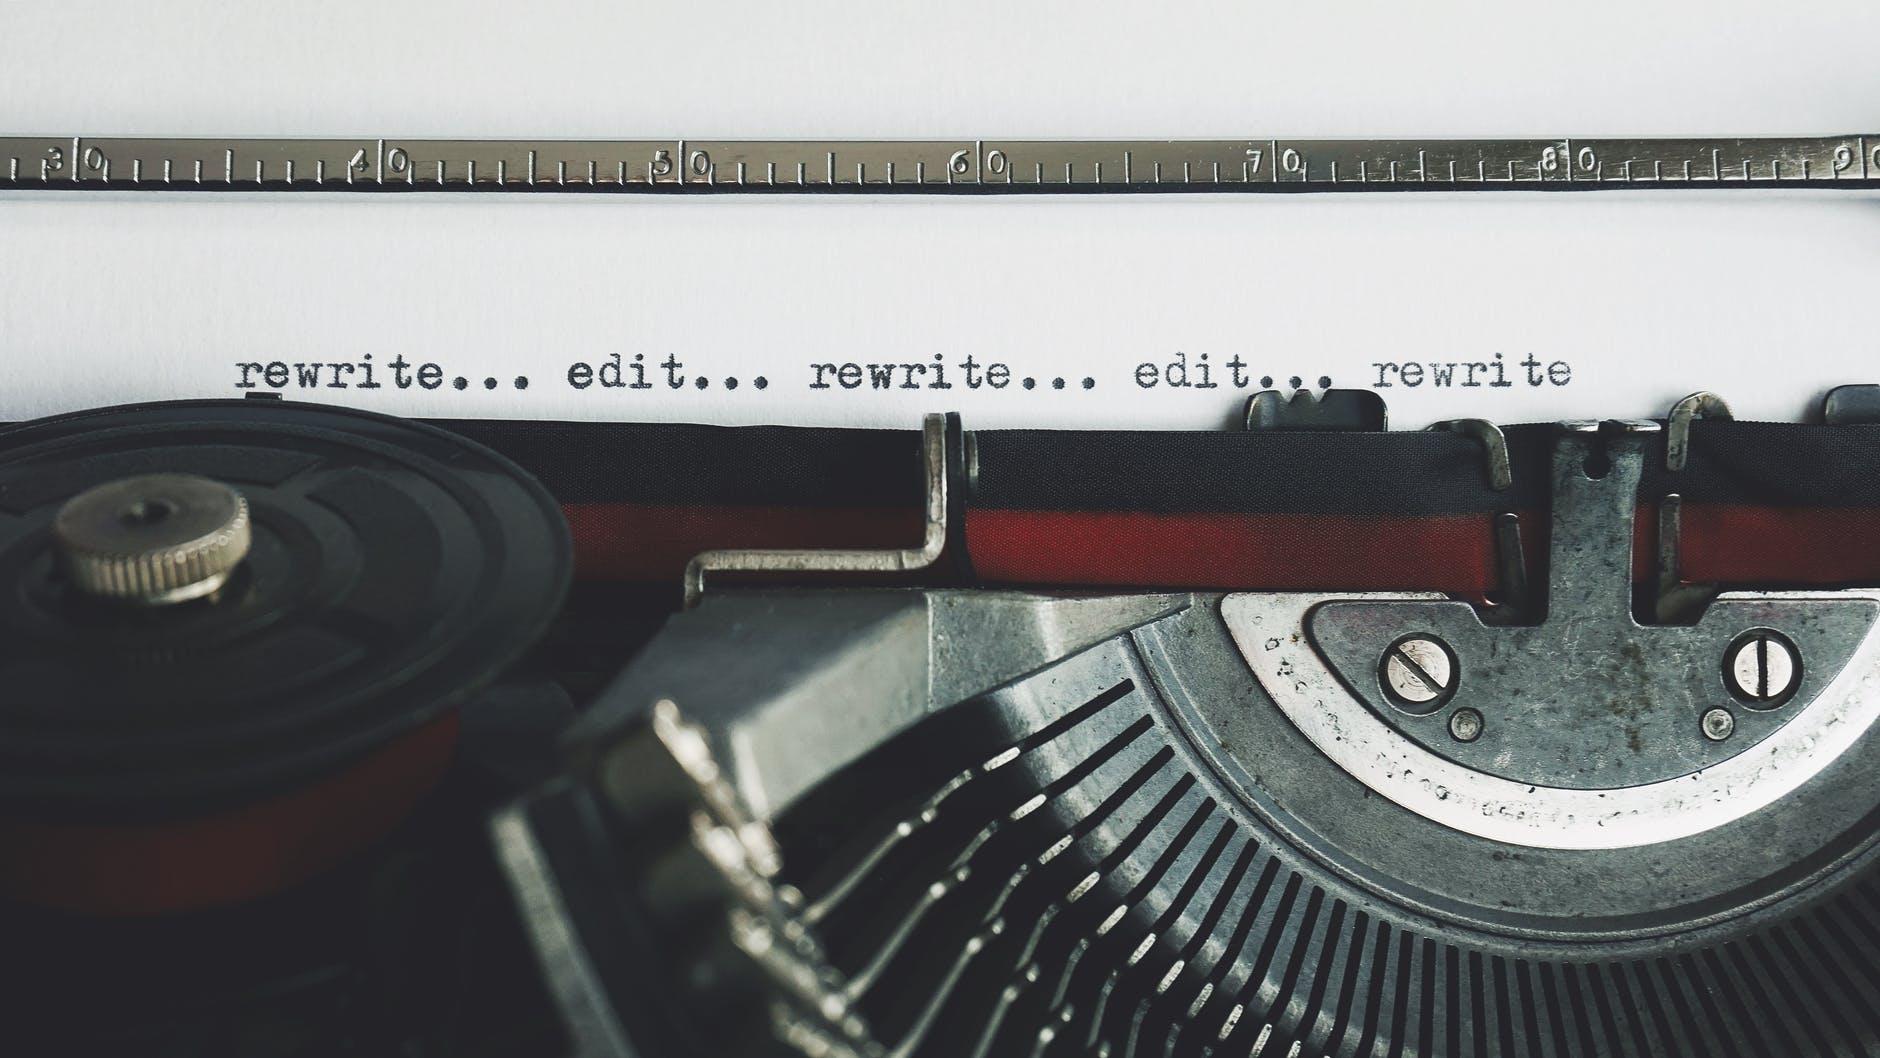 rewrite edit text on a typewriter